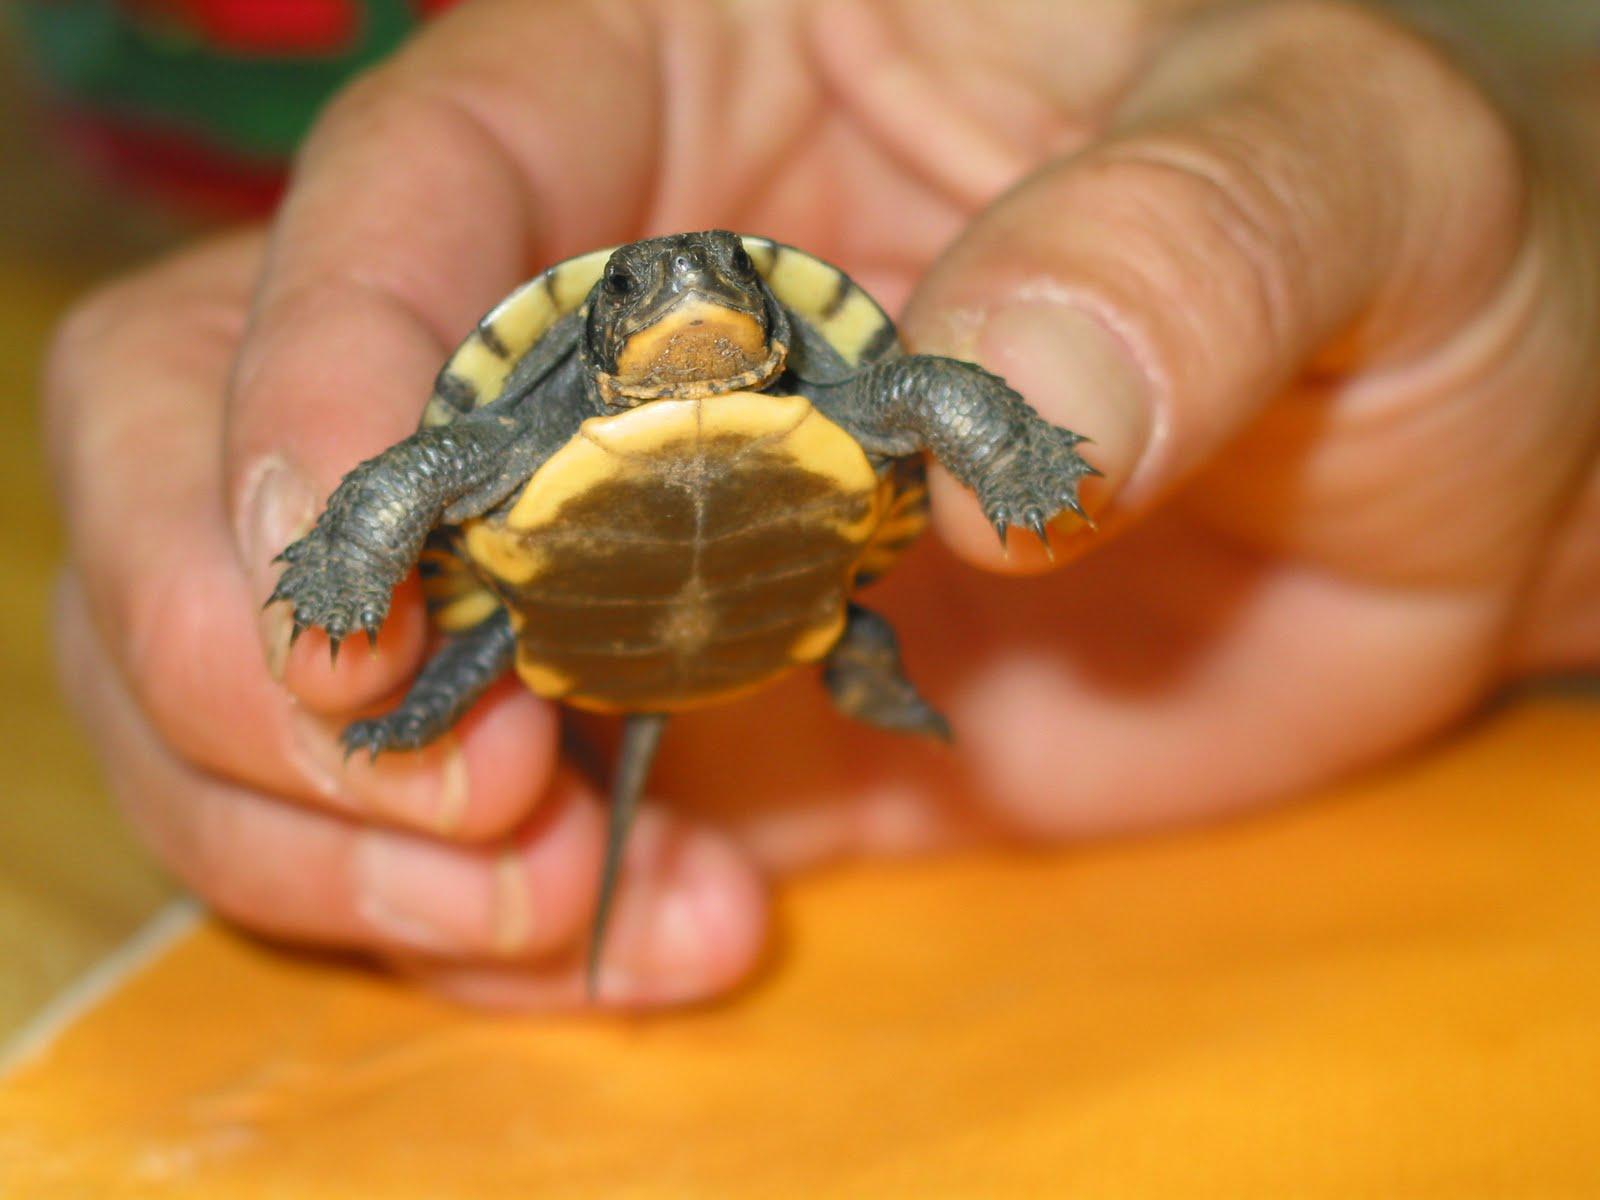 Quarter Sized Turtles